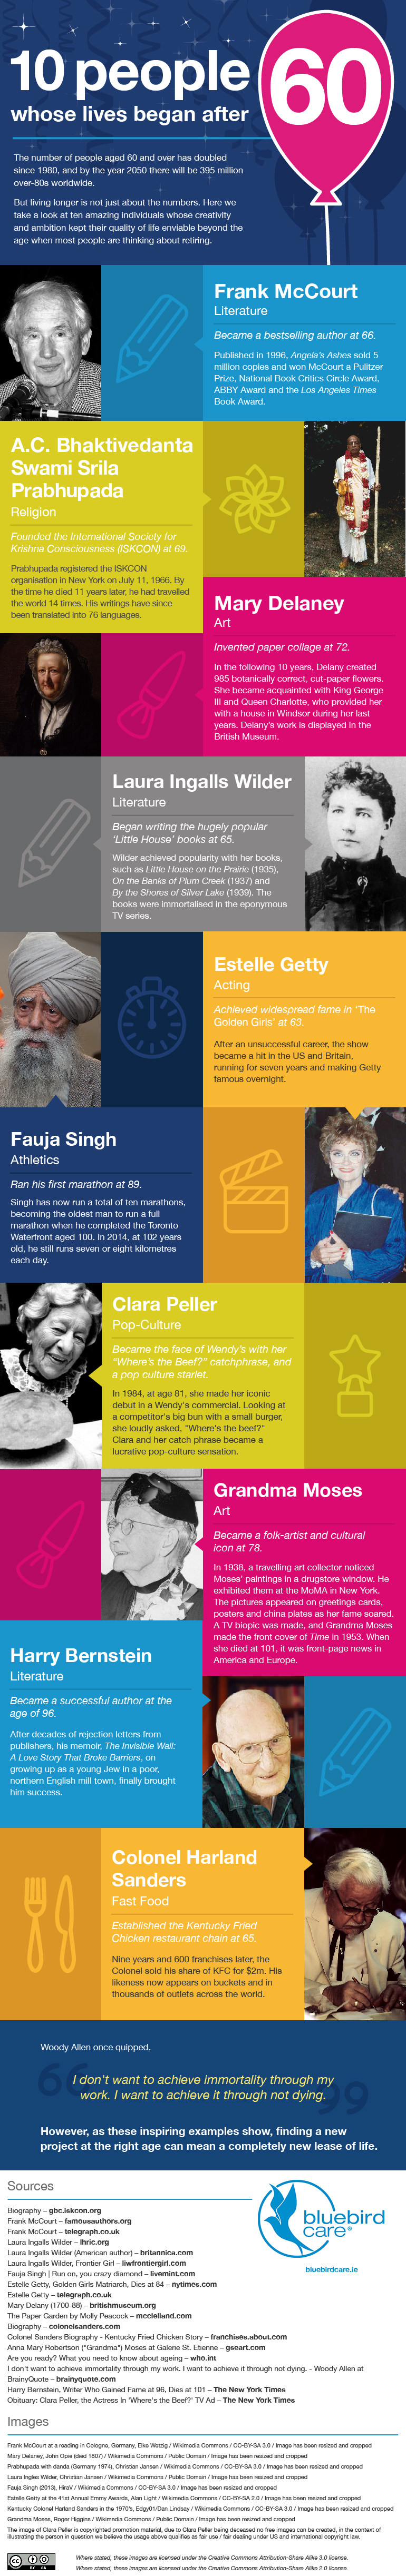 10 People Whose Lives Began at 60